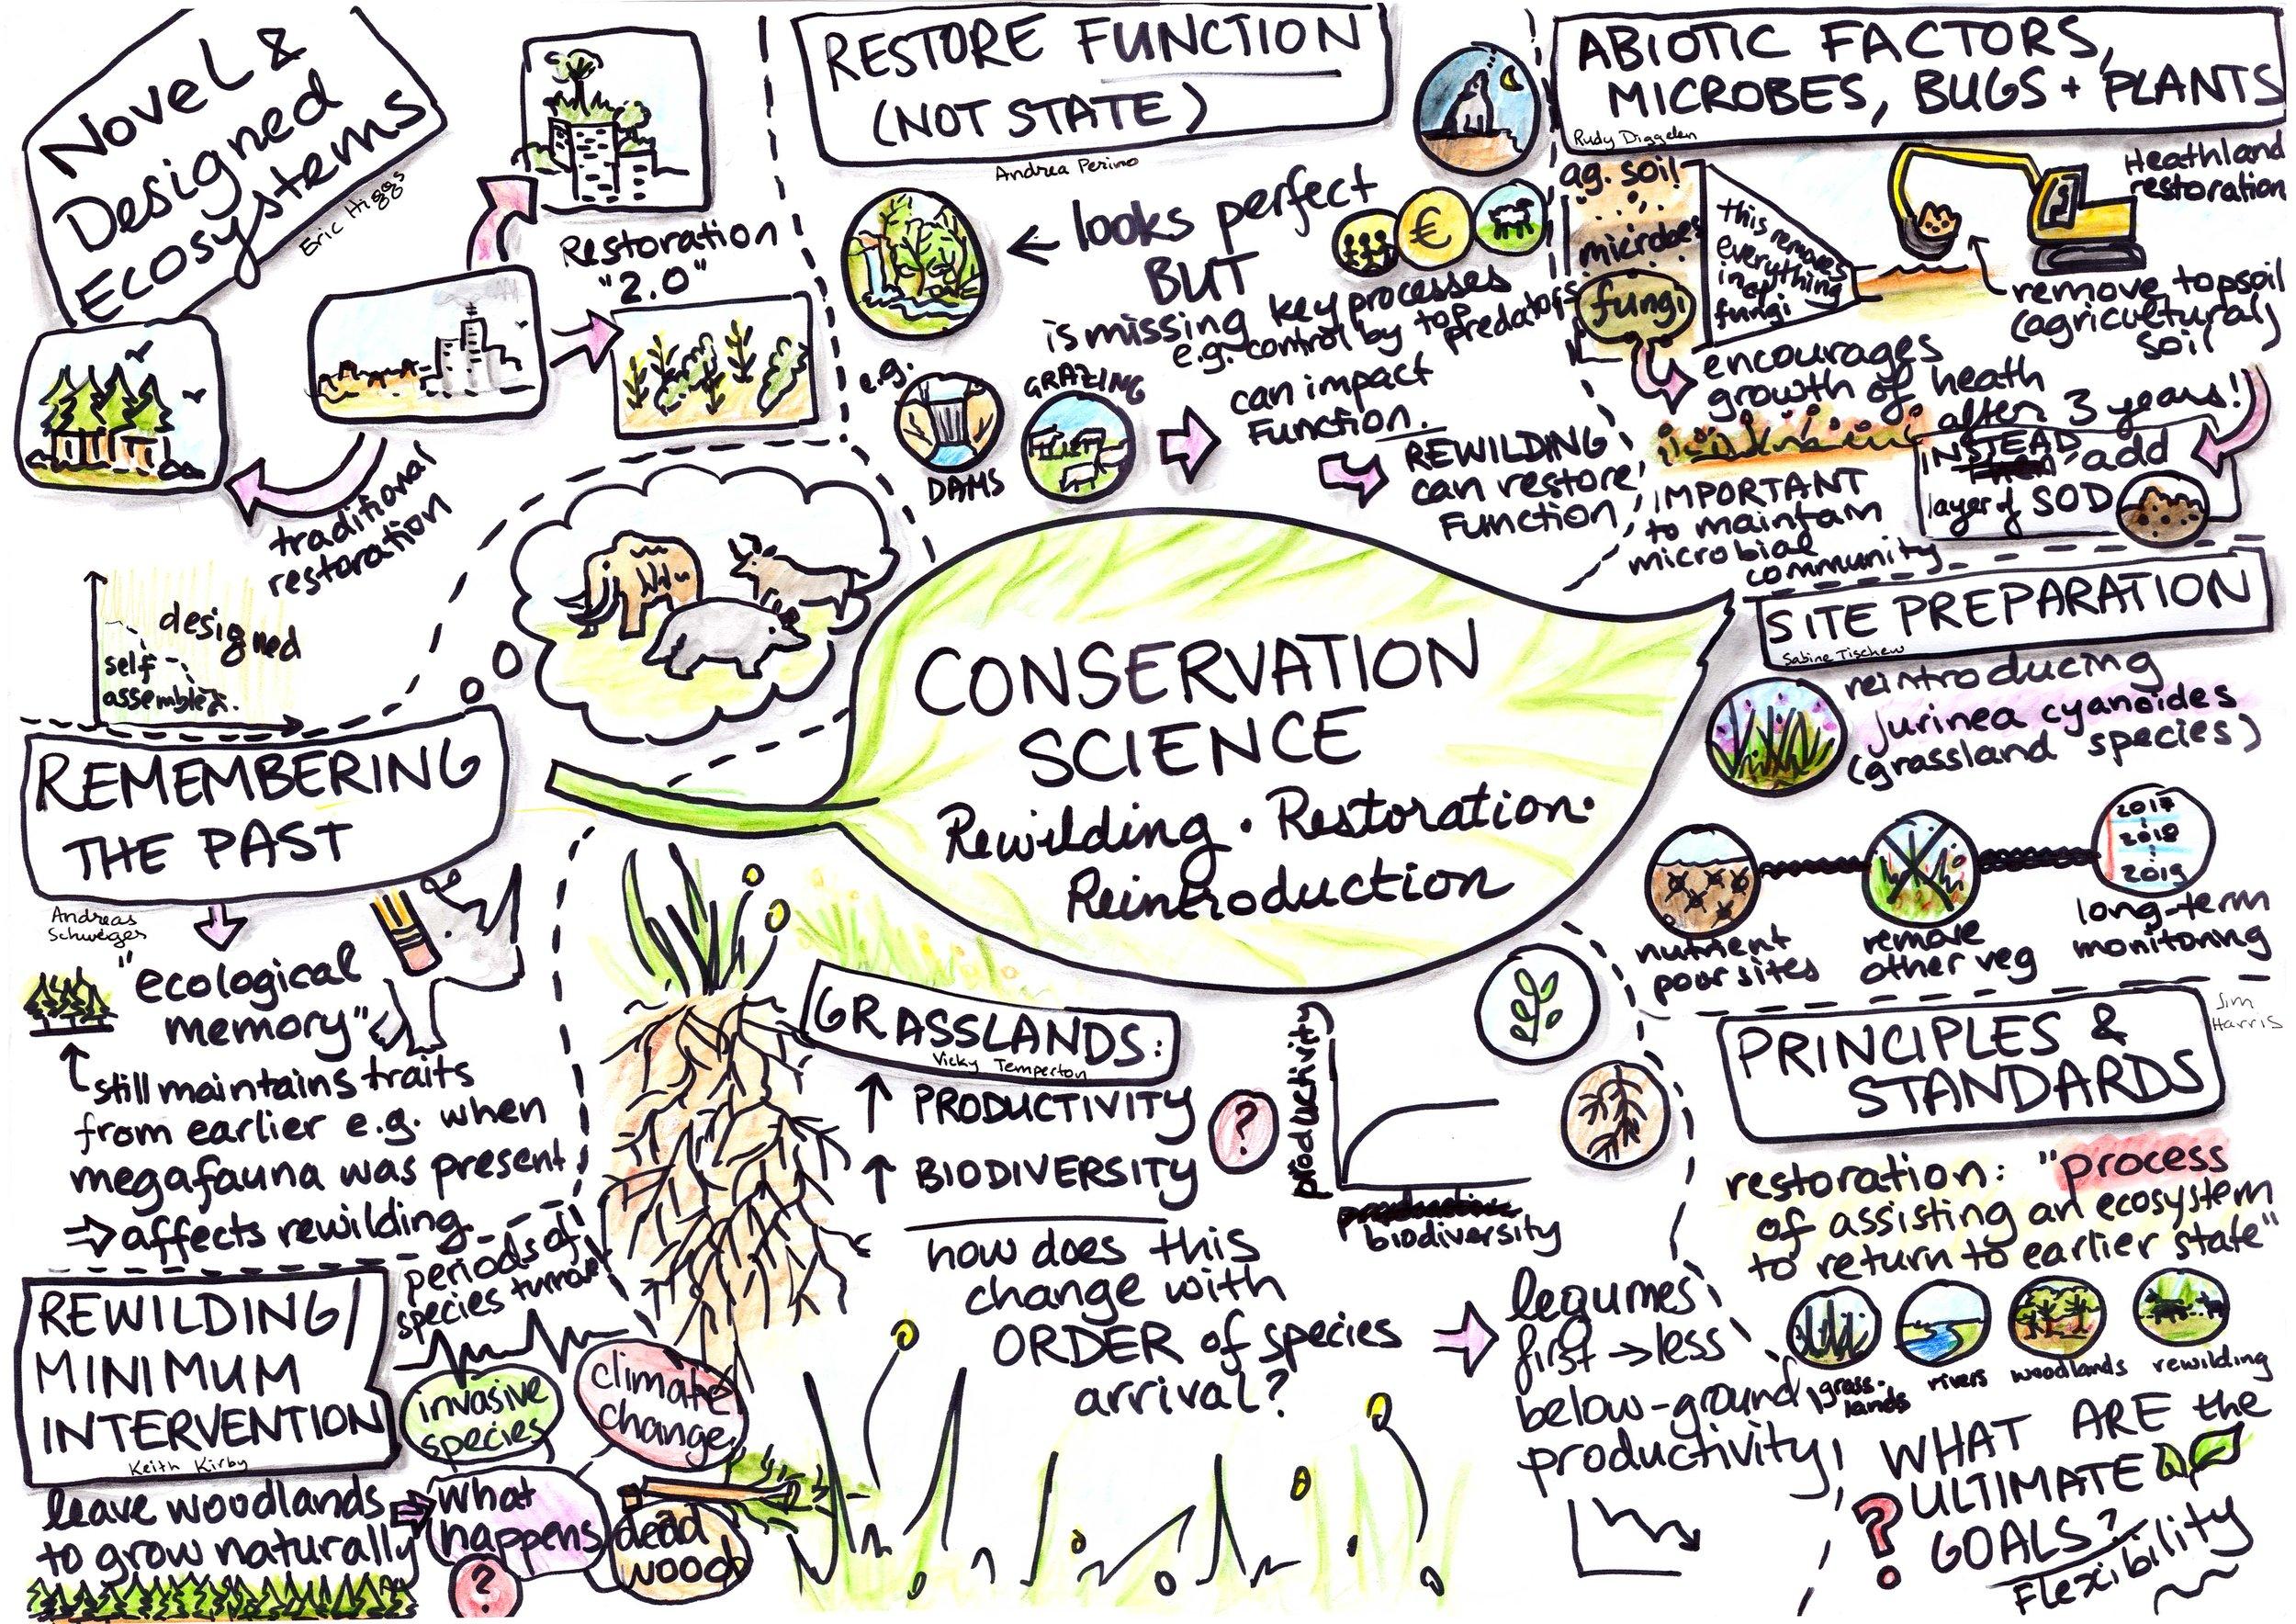 Conservation Science: Reintroductions, Restoration & Rewilding